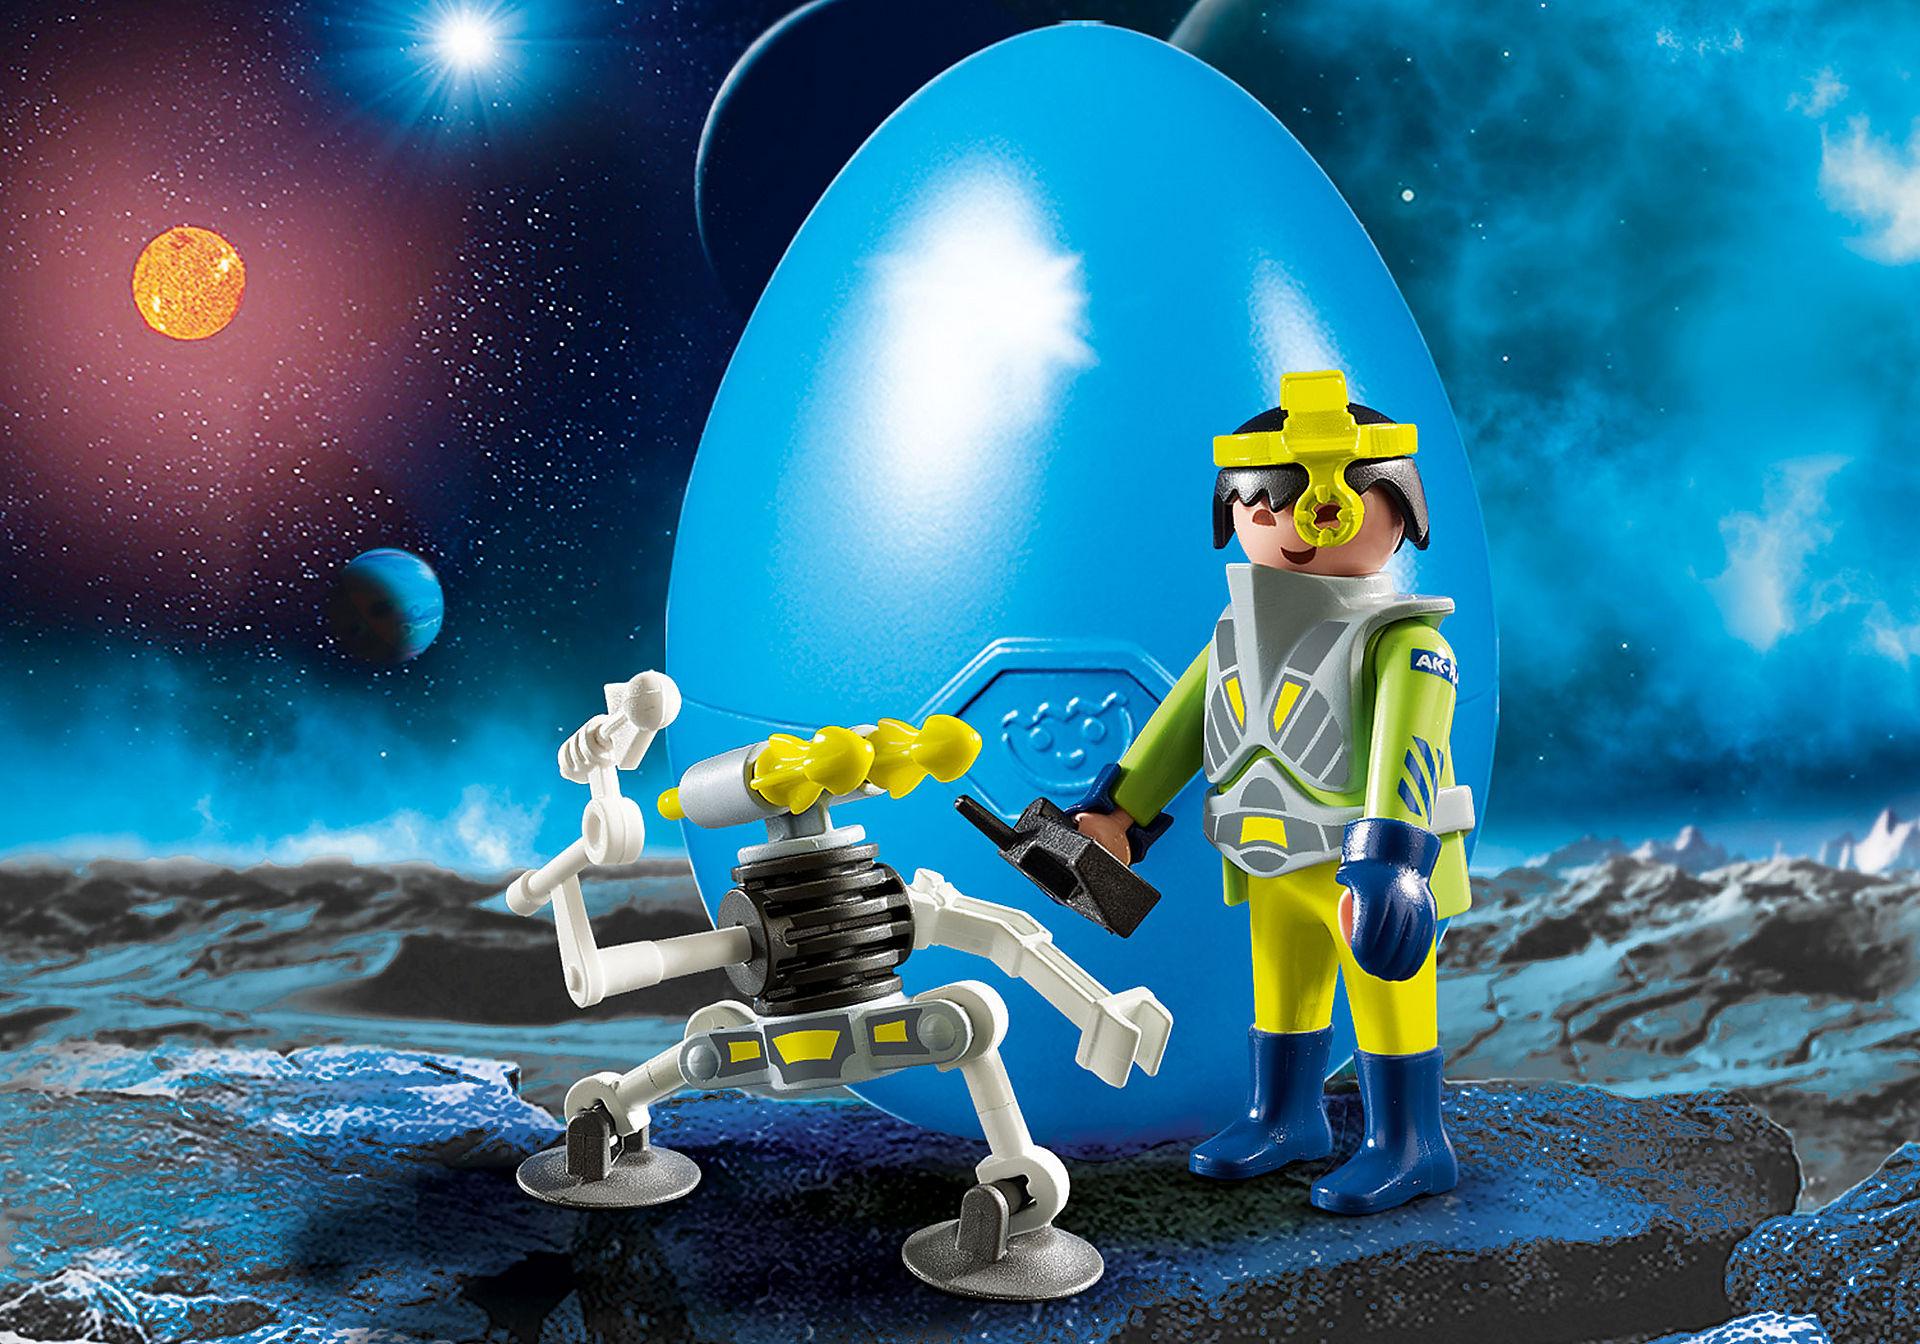 9416 Agente spaziale con Robot zoom image1